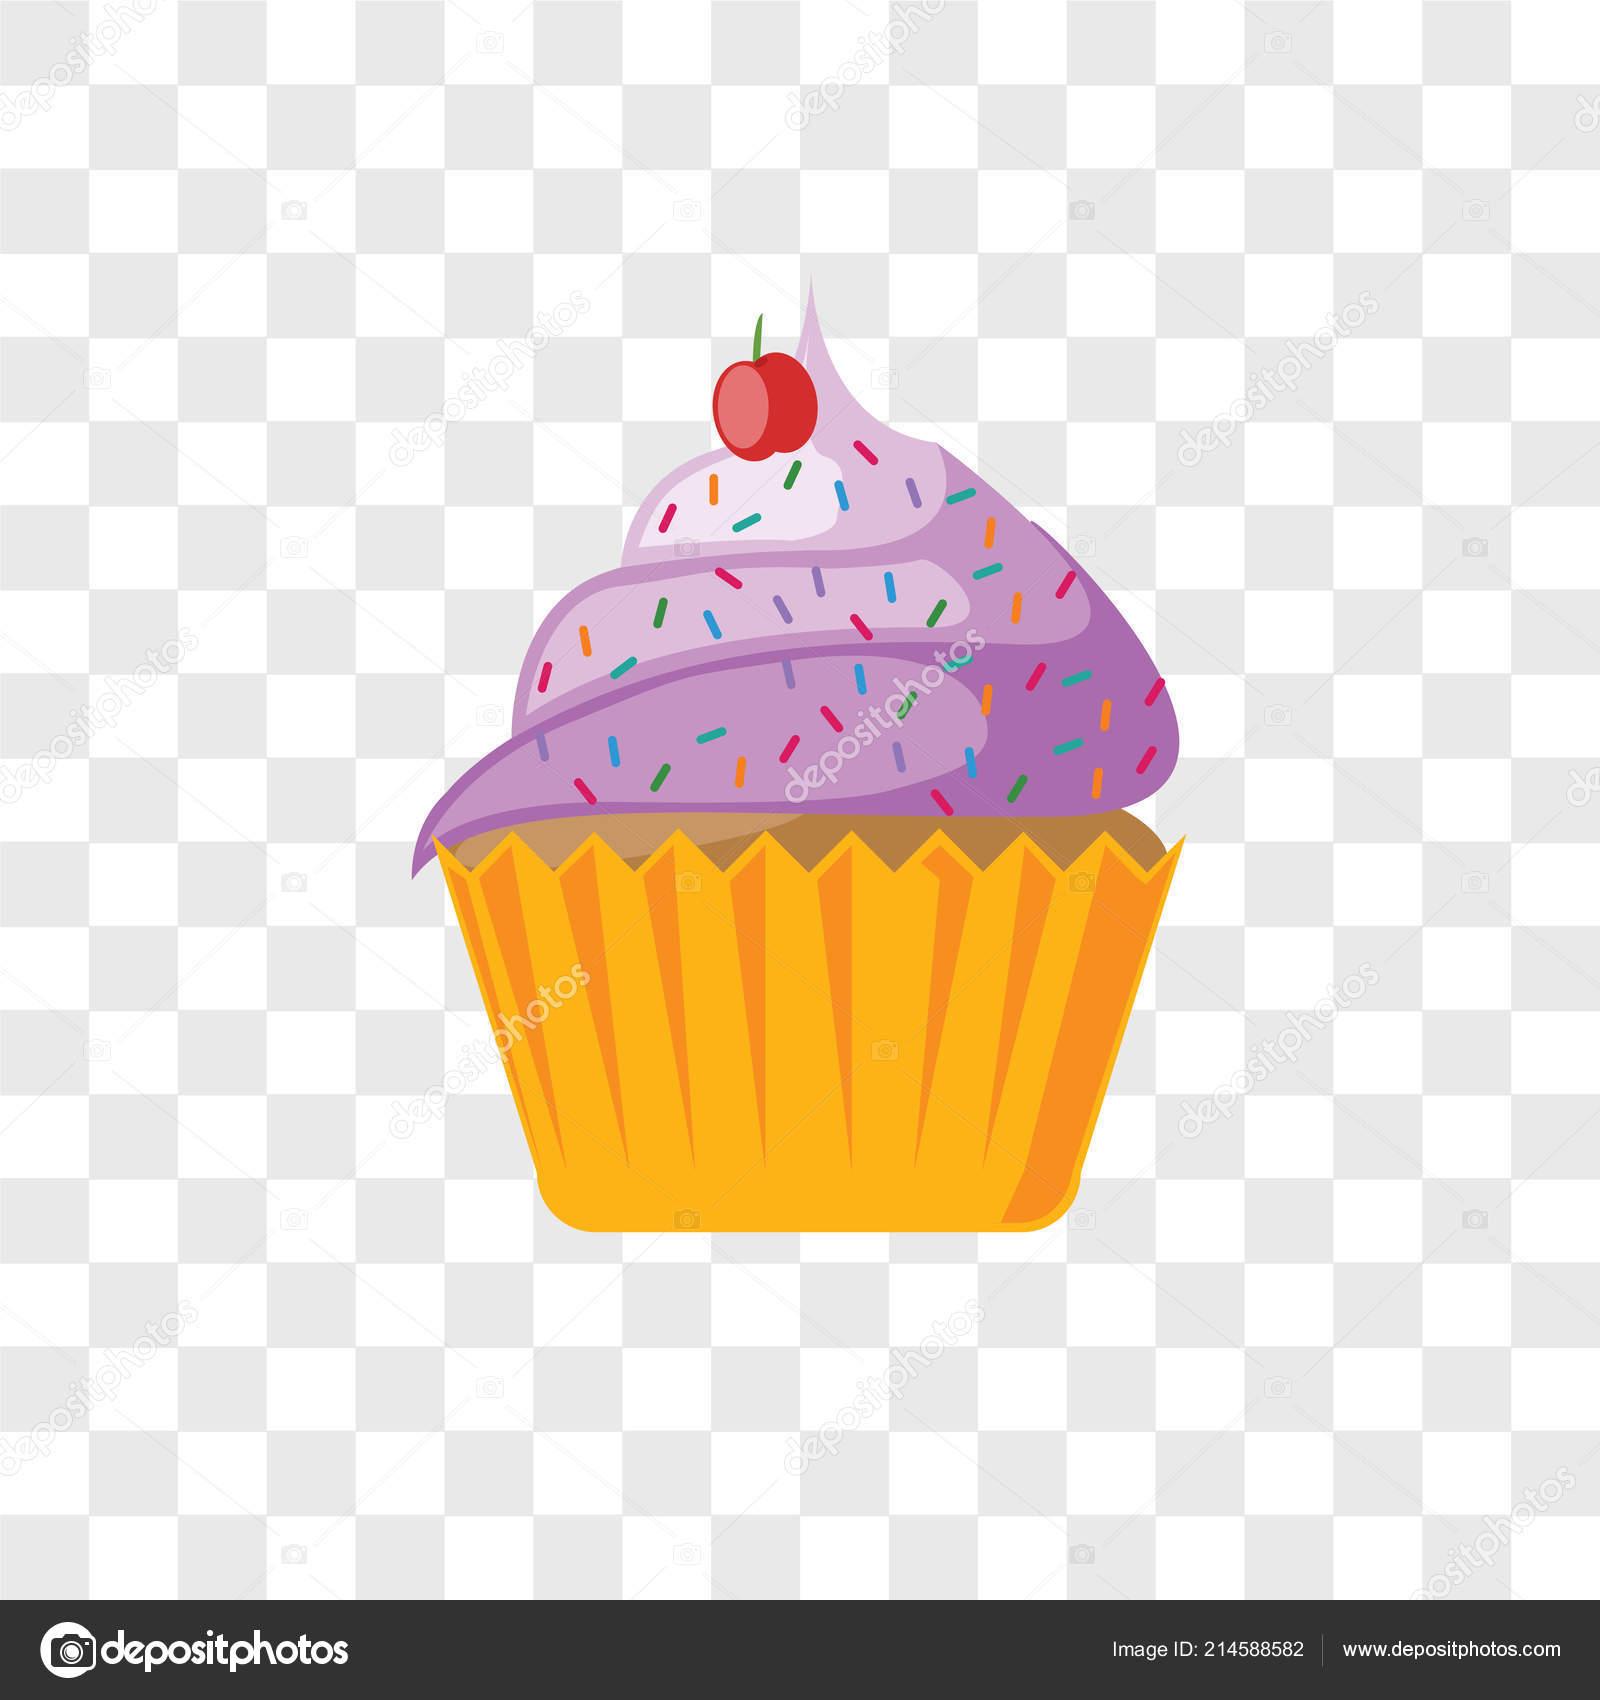 cupcake vector icon isolated transparent background cupcake logo concept stock vector c tvectoricons 214588582 https depositphotos com 214588582 stock illustration cupcake vector icon isolated transparent html